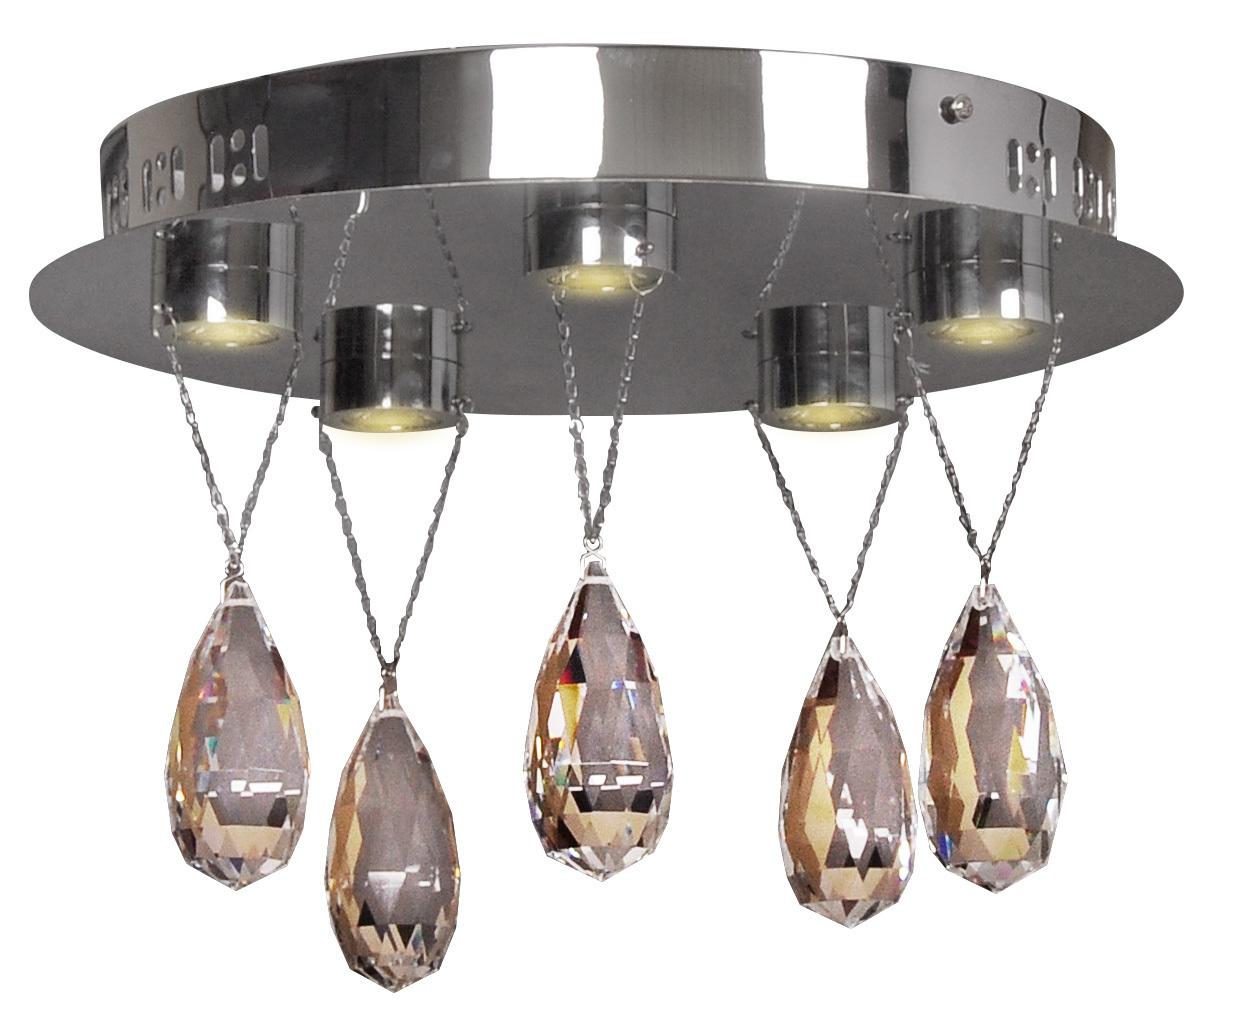 Prisma Deckenleuchte Plafond 5X3W Led Chrome